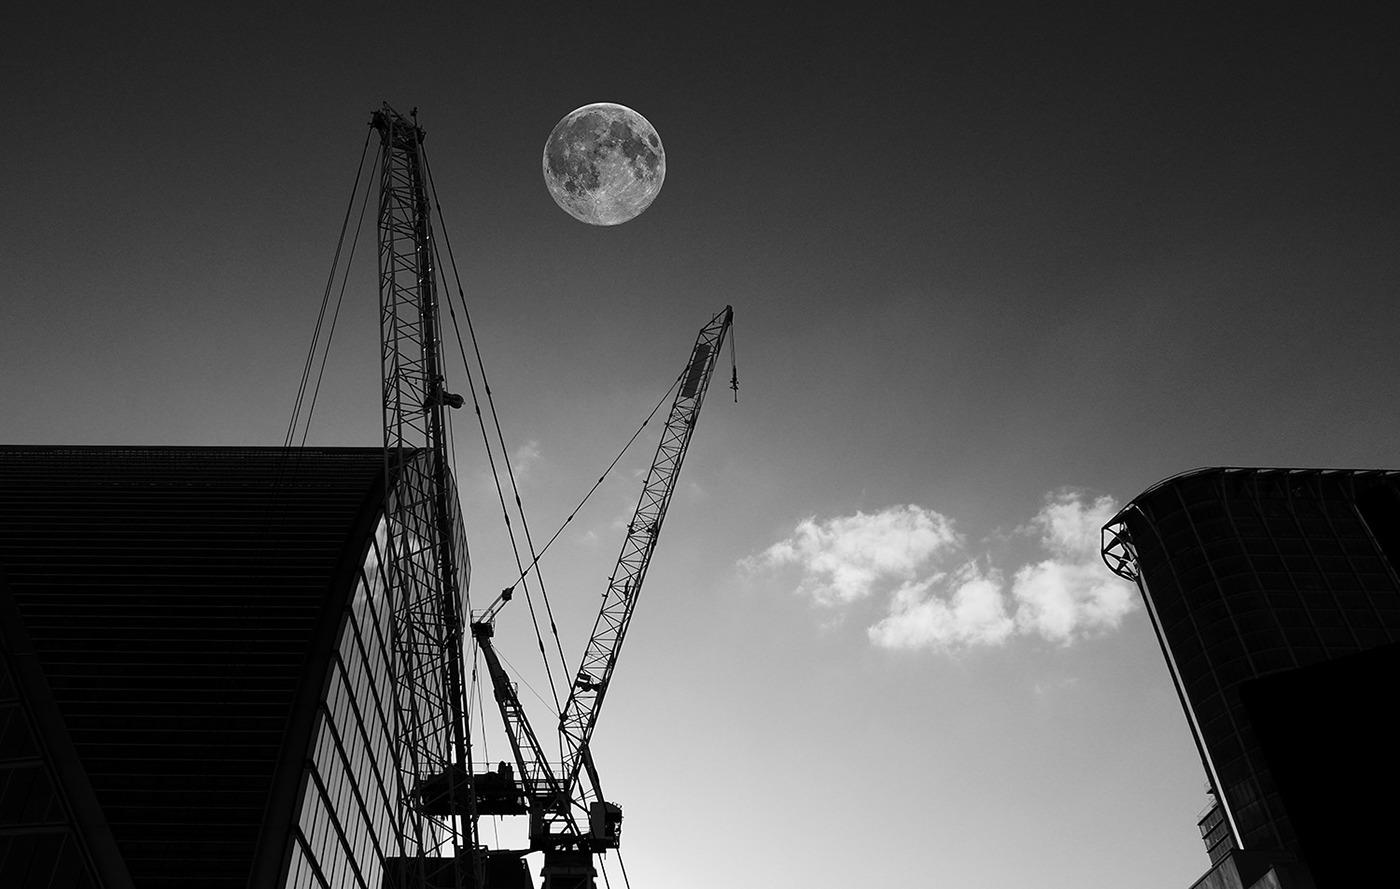 to-the-moon-vladimir-petek-photography.jpg